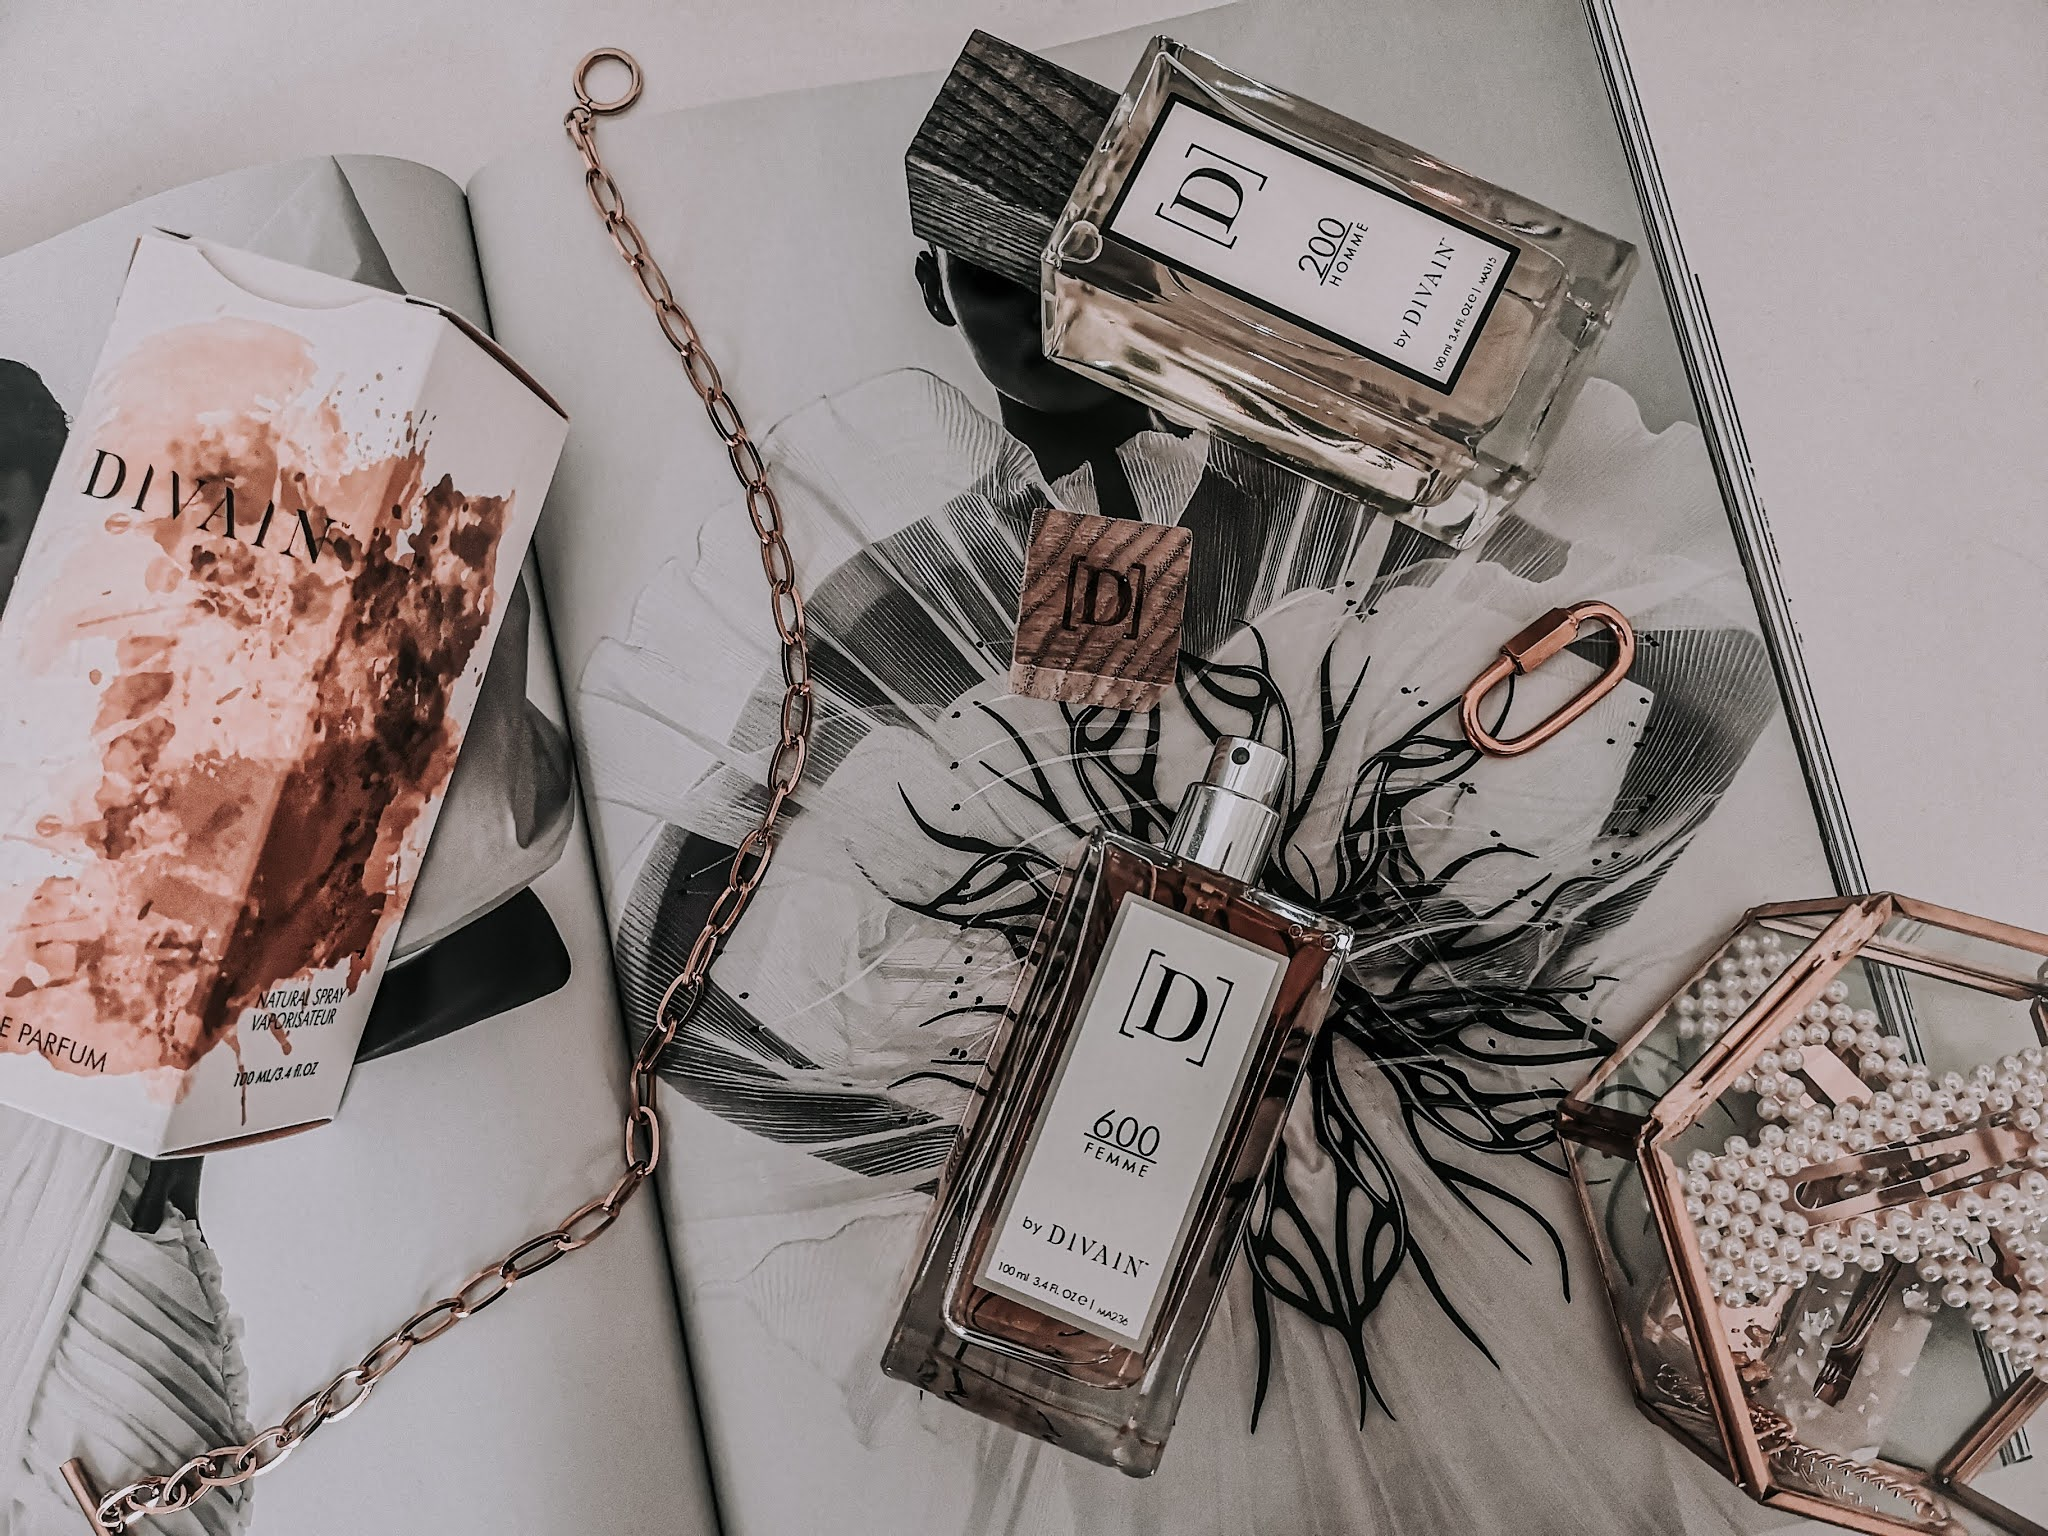 avis-parfum-divain